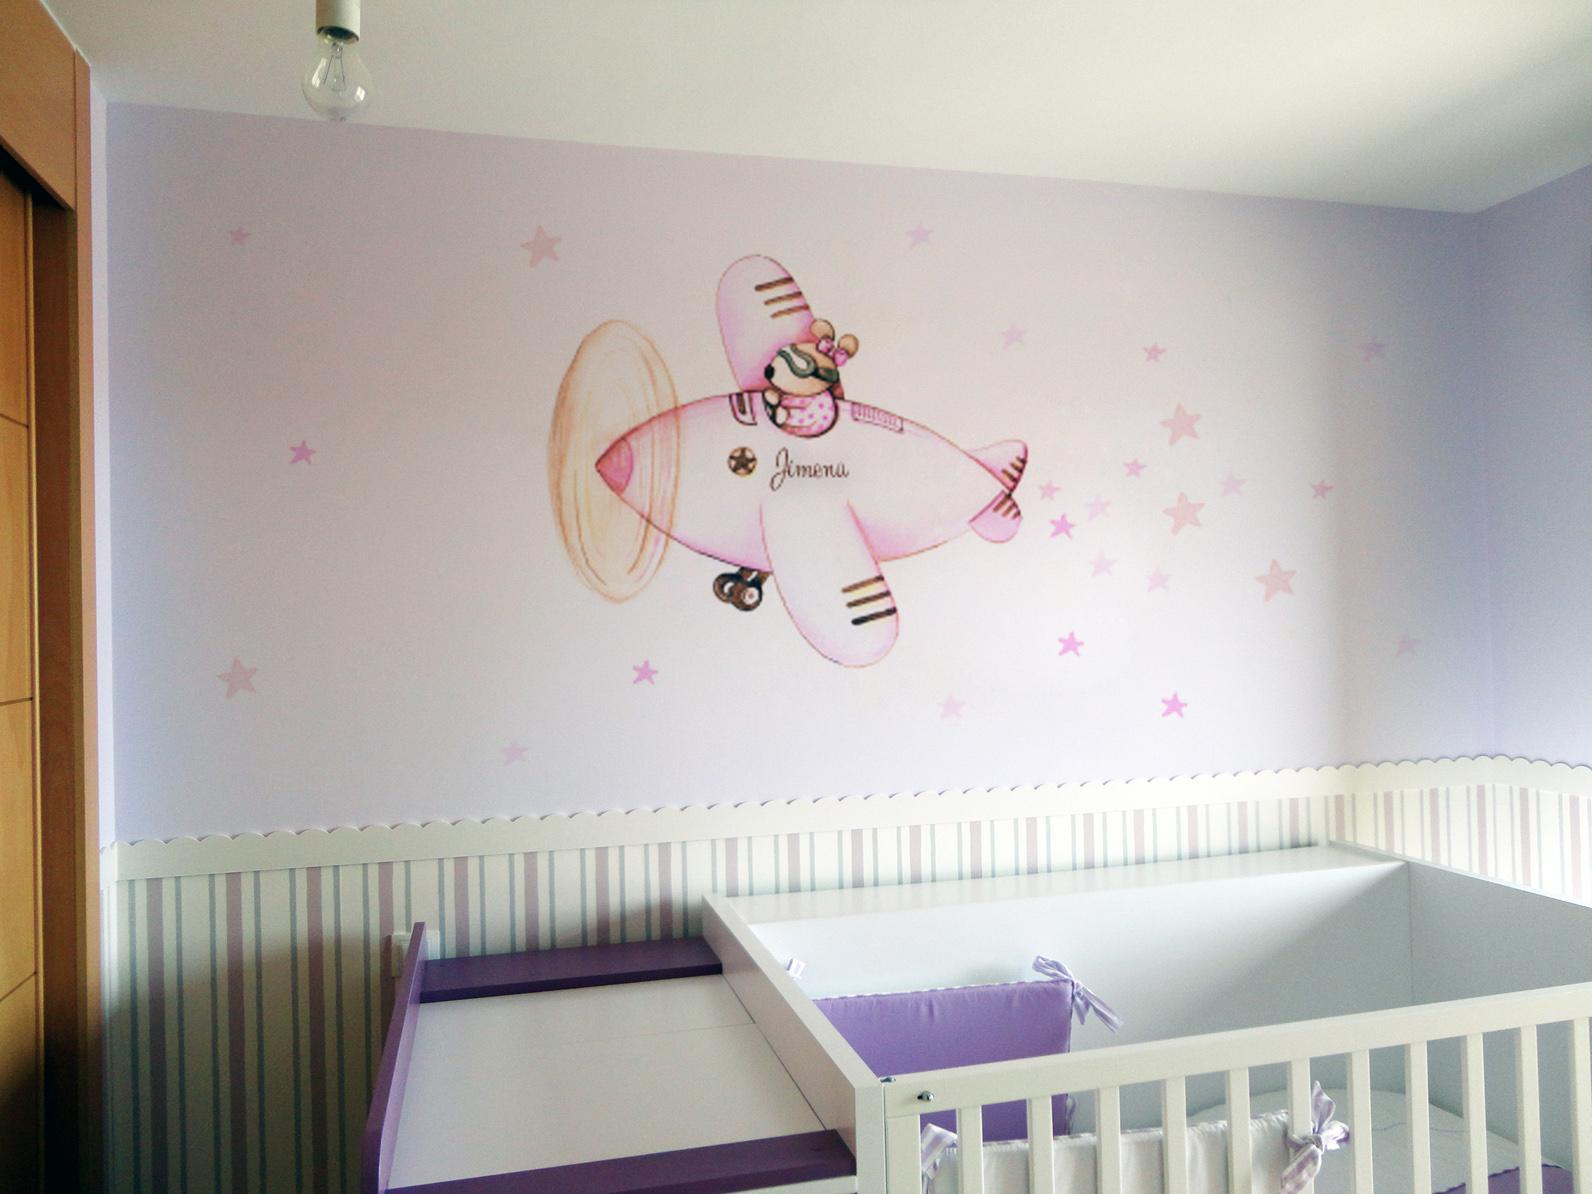 VINILO INFANTIL: Conejita en avión rosa